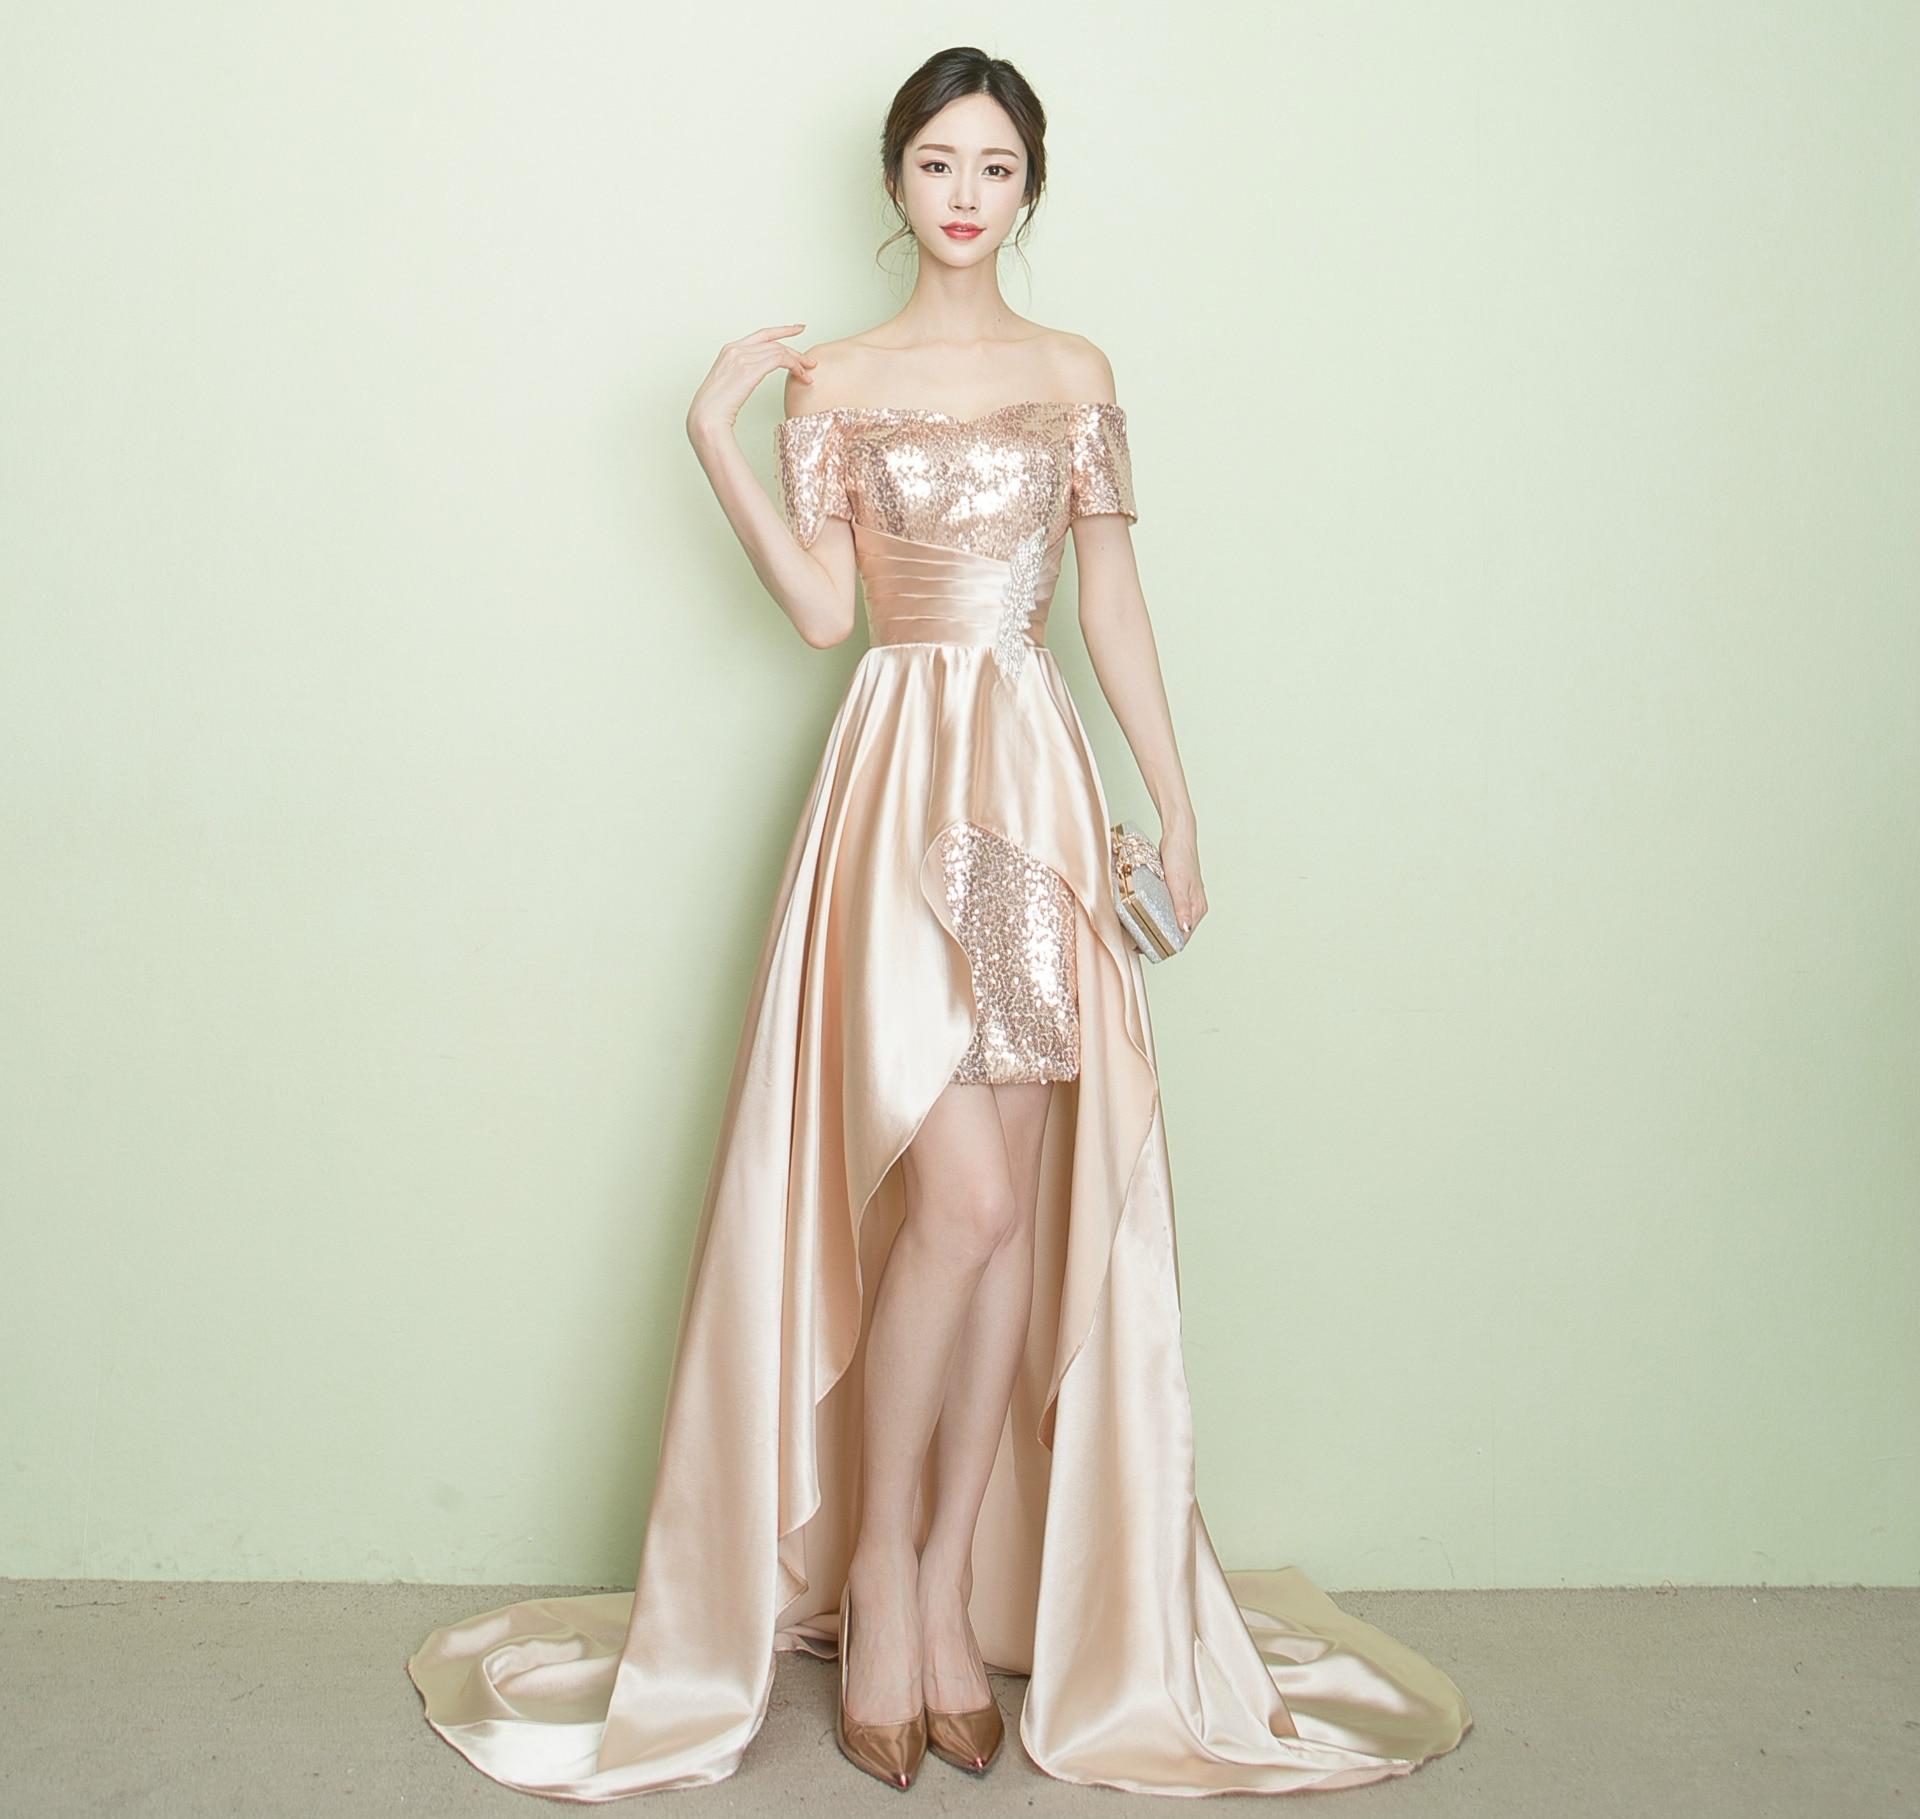 Hi-Low Sweetheart Evening Dresses Crystals Sequin Lace Up Back Formal Vestido De Fiesta